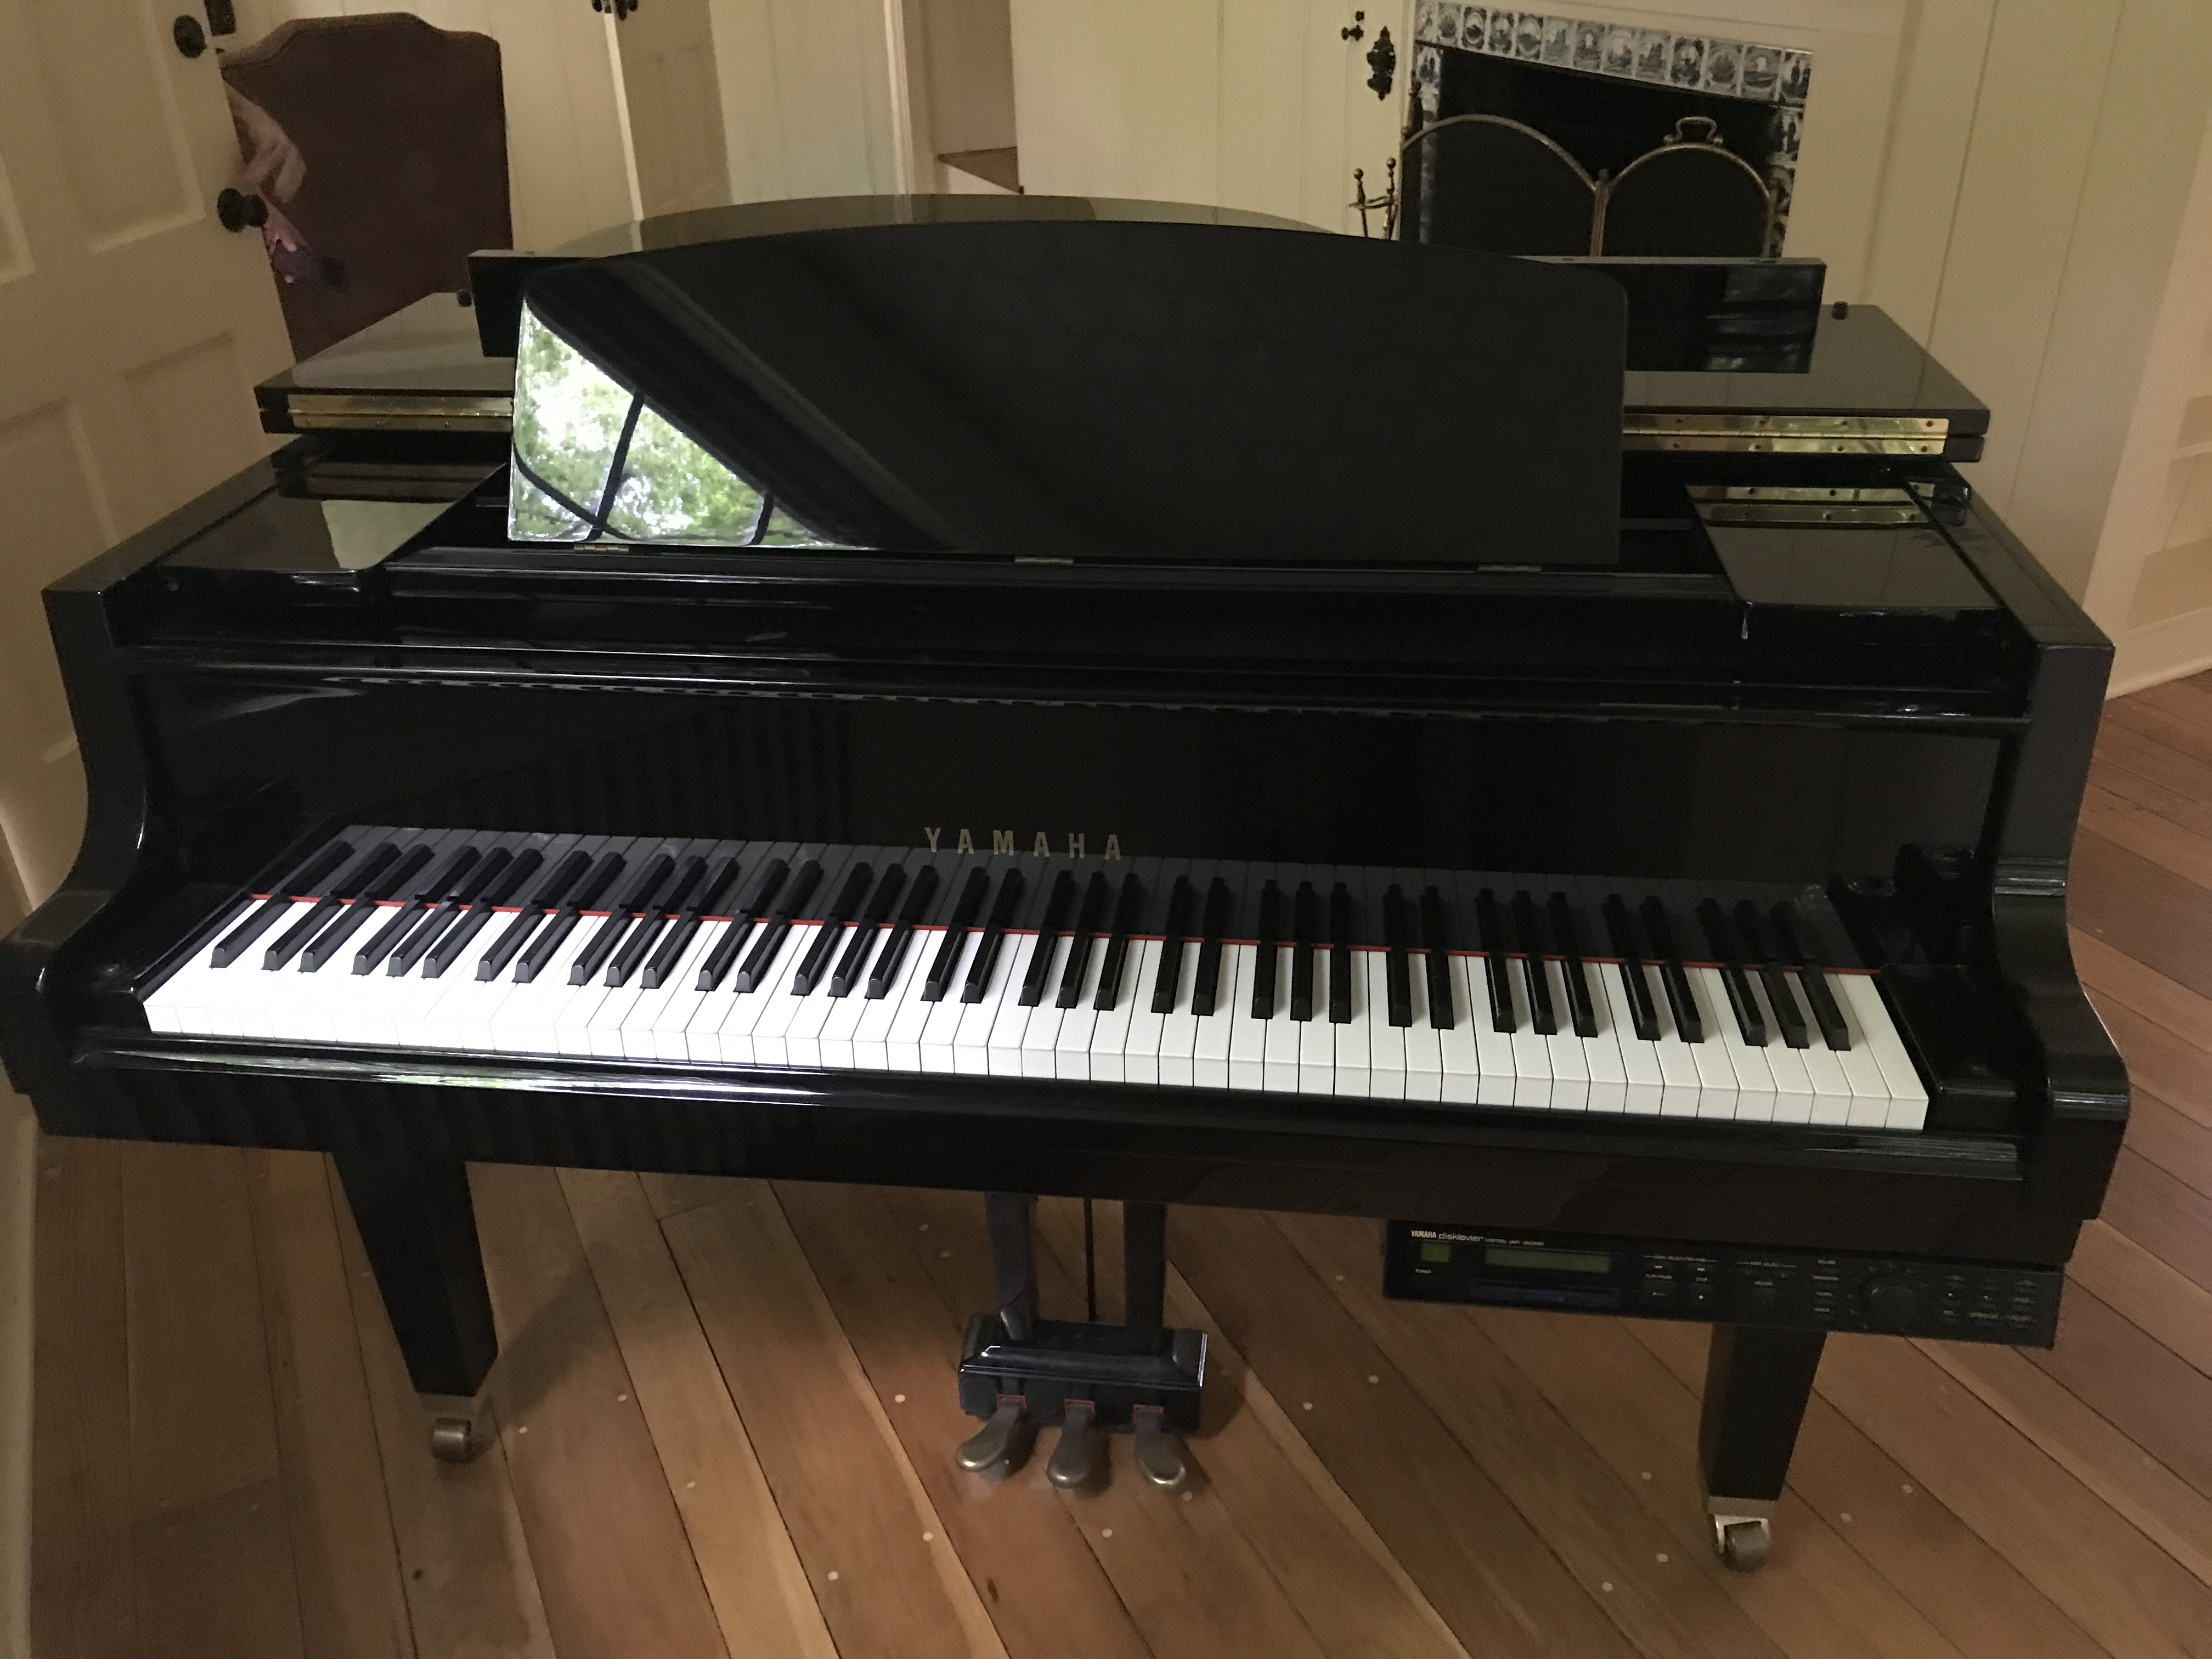 Yamaha GH1 1996 Piano